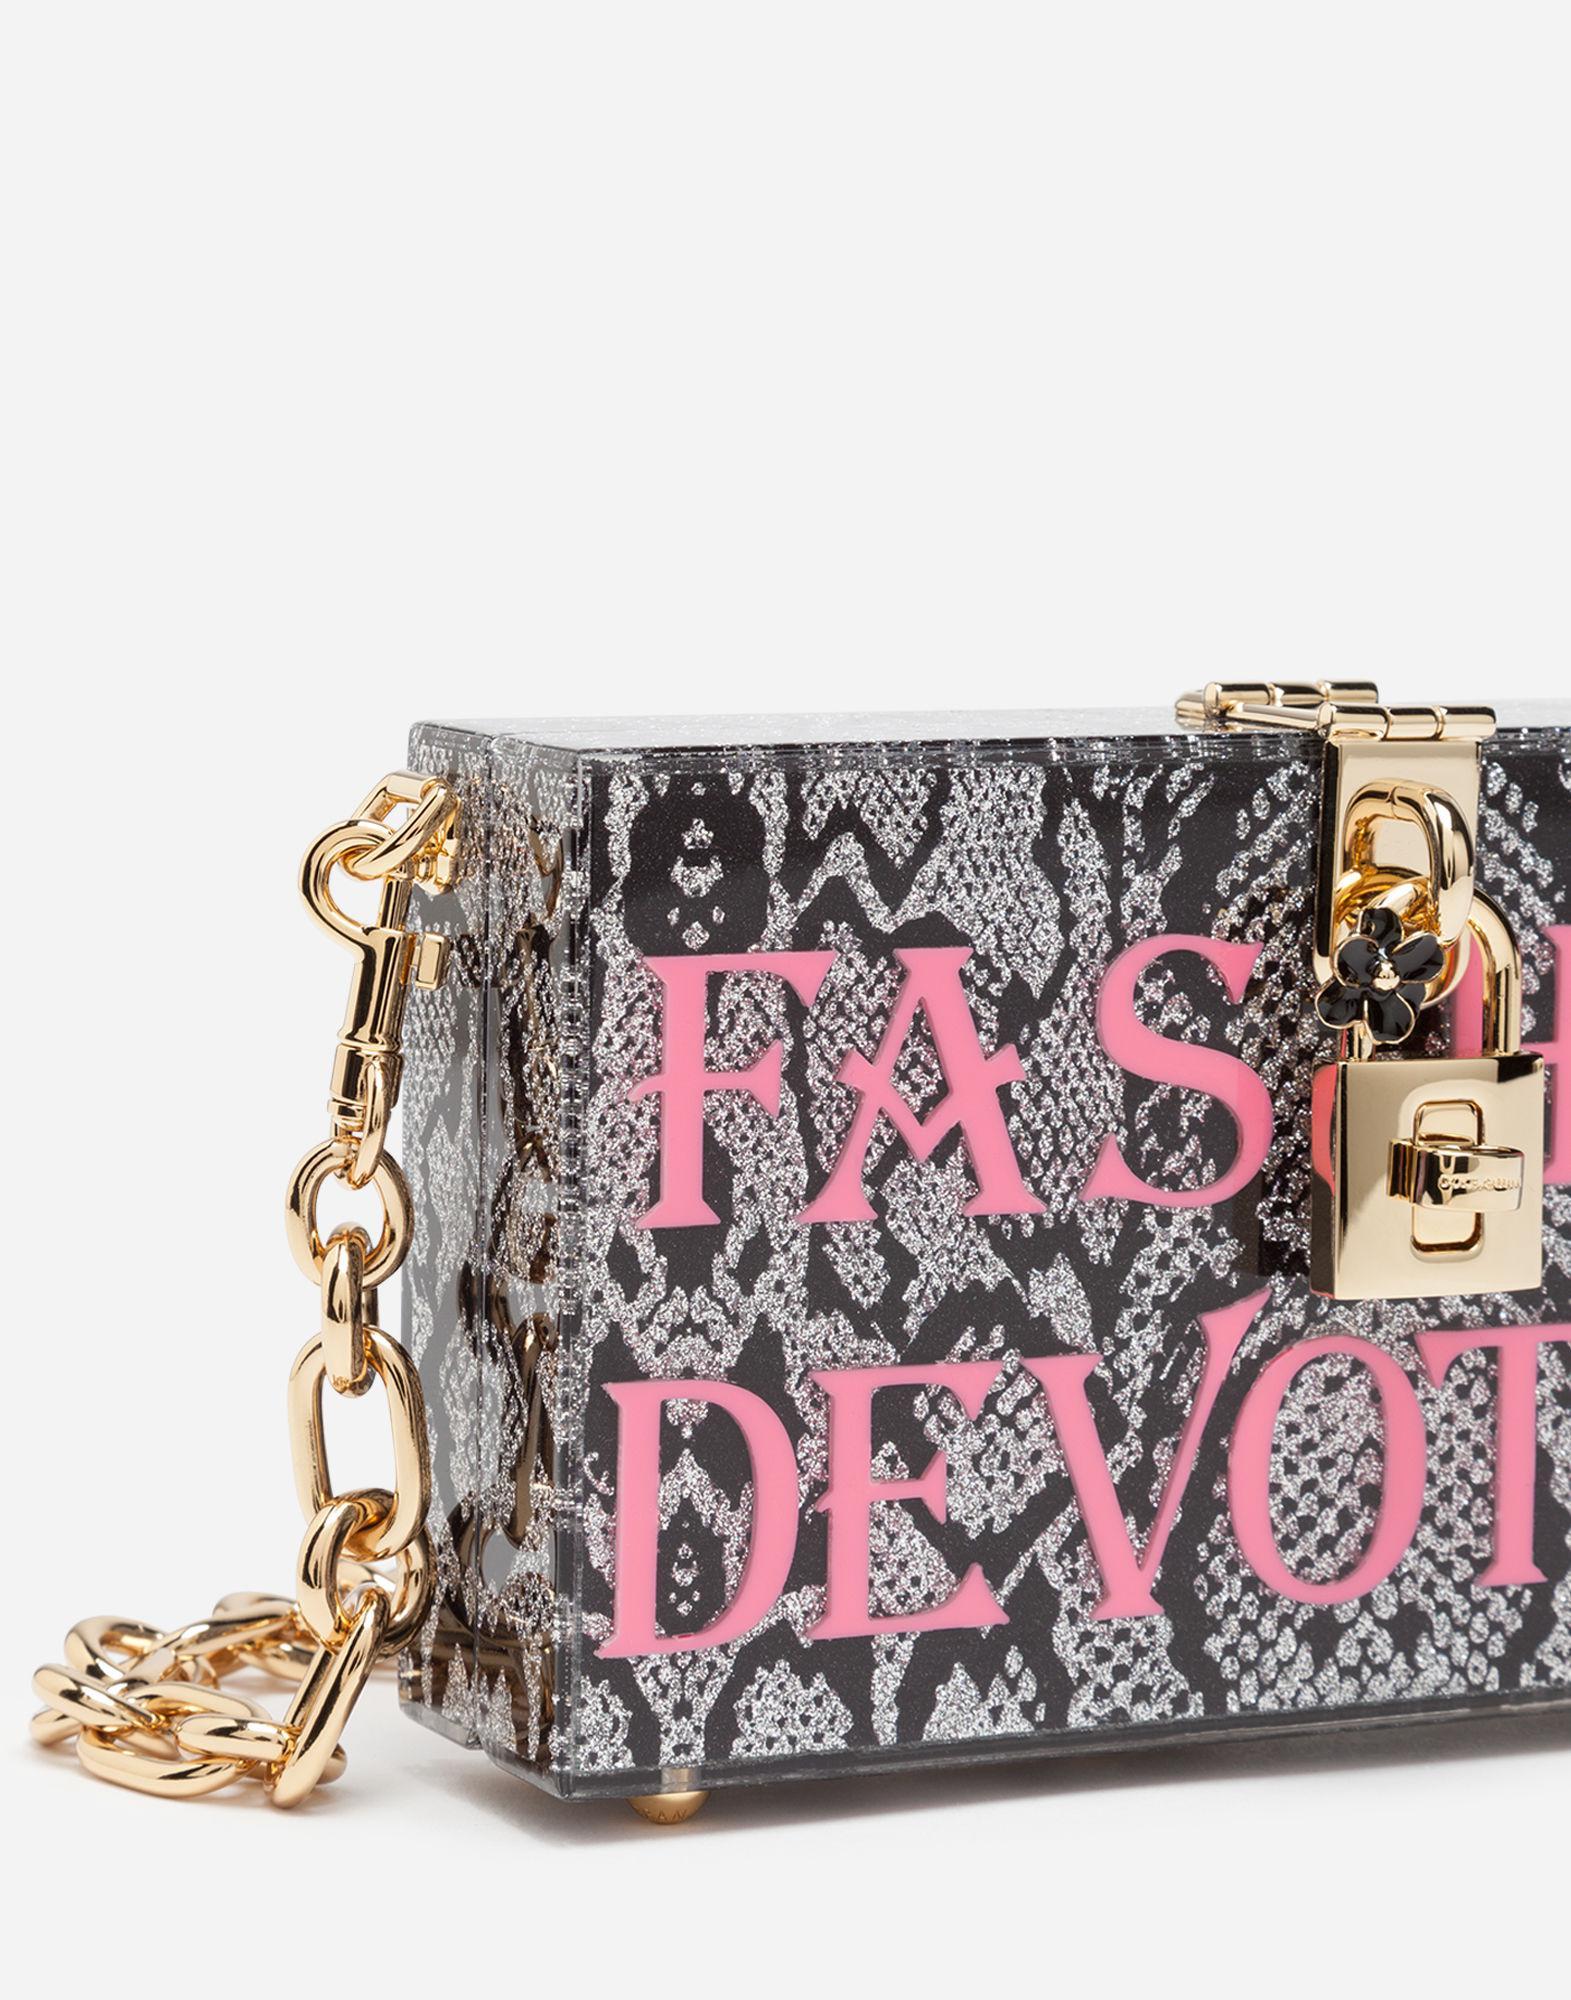 Lyst - Dolce   Gabbana Dolce Box Clutch In Plexi With Chain 56c3d6f729639